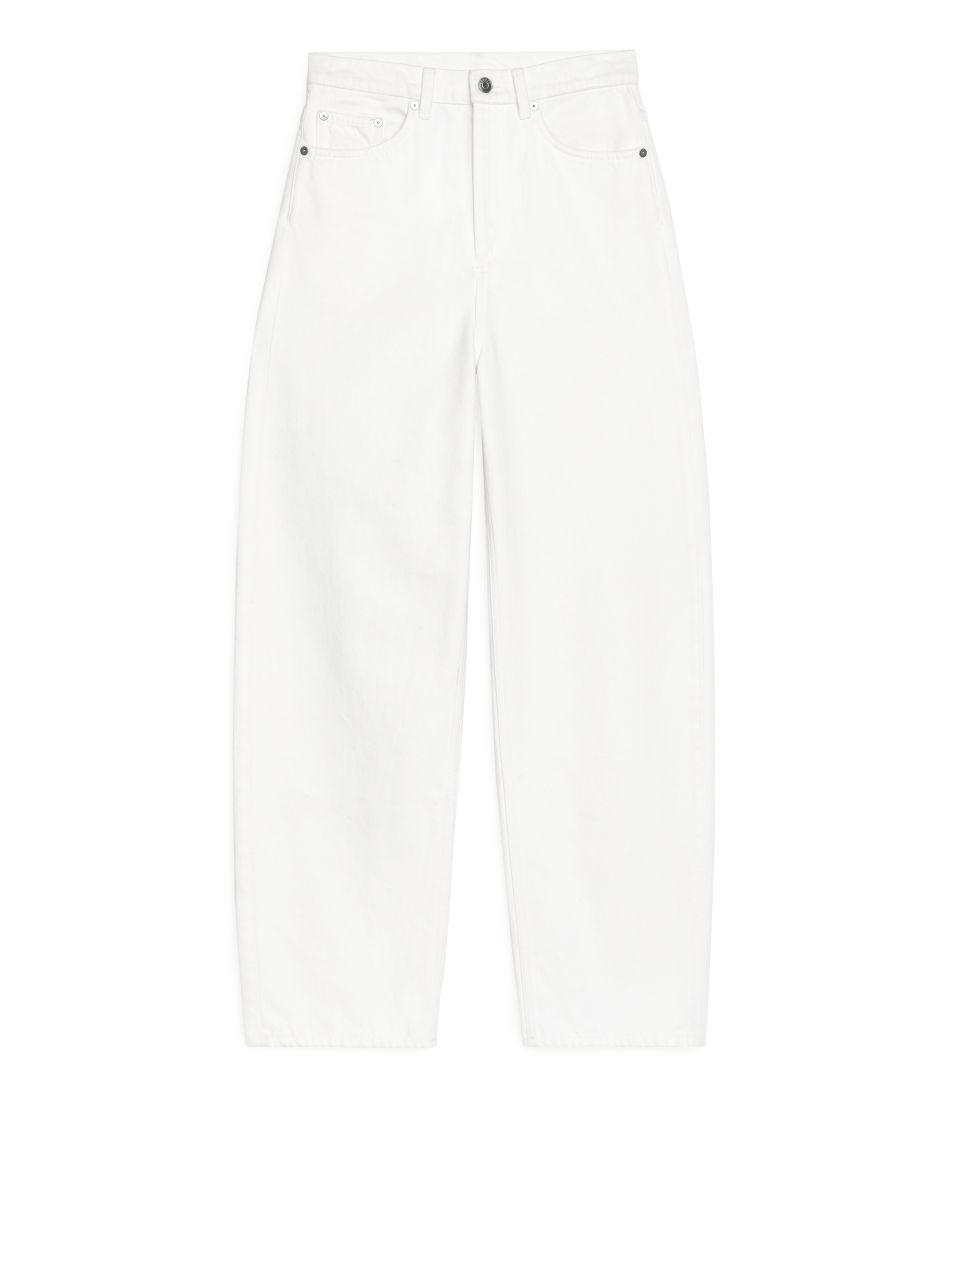 LOOSE Barrel Leg Overdyed Jeans - White